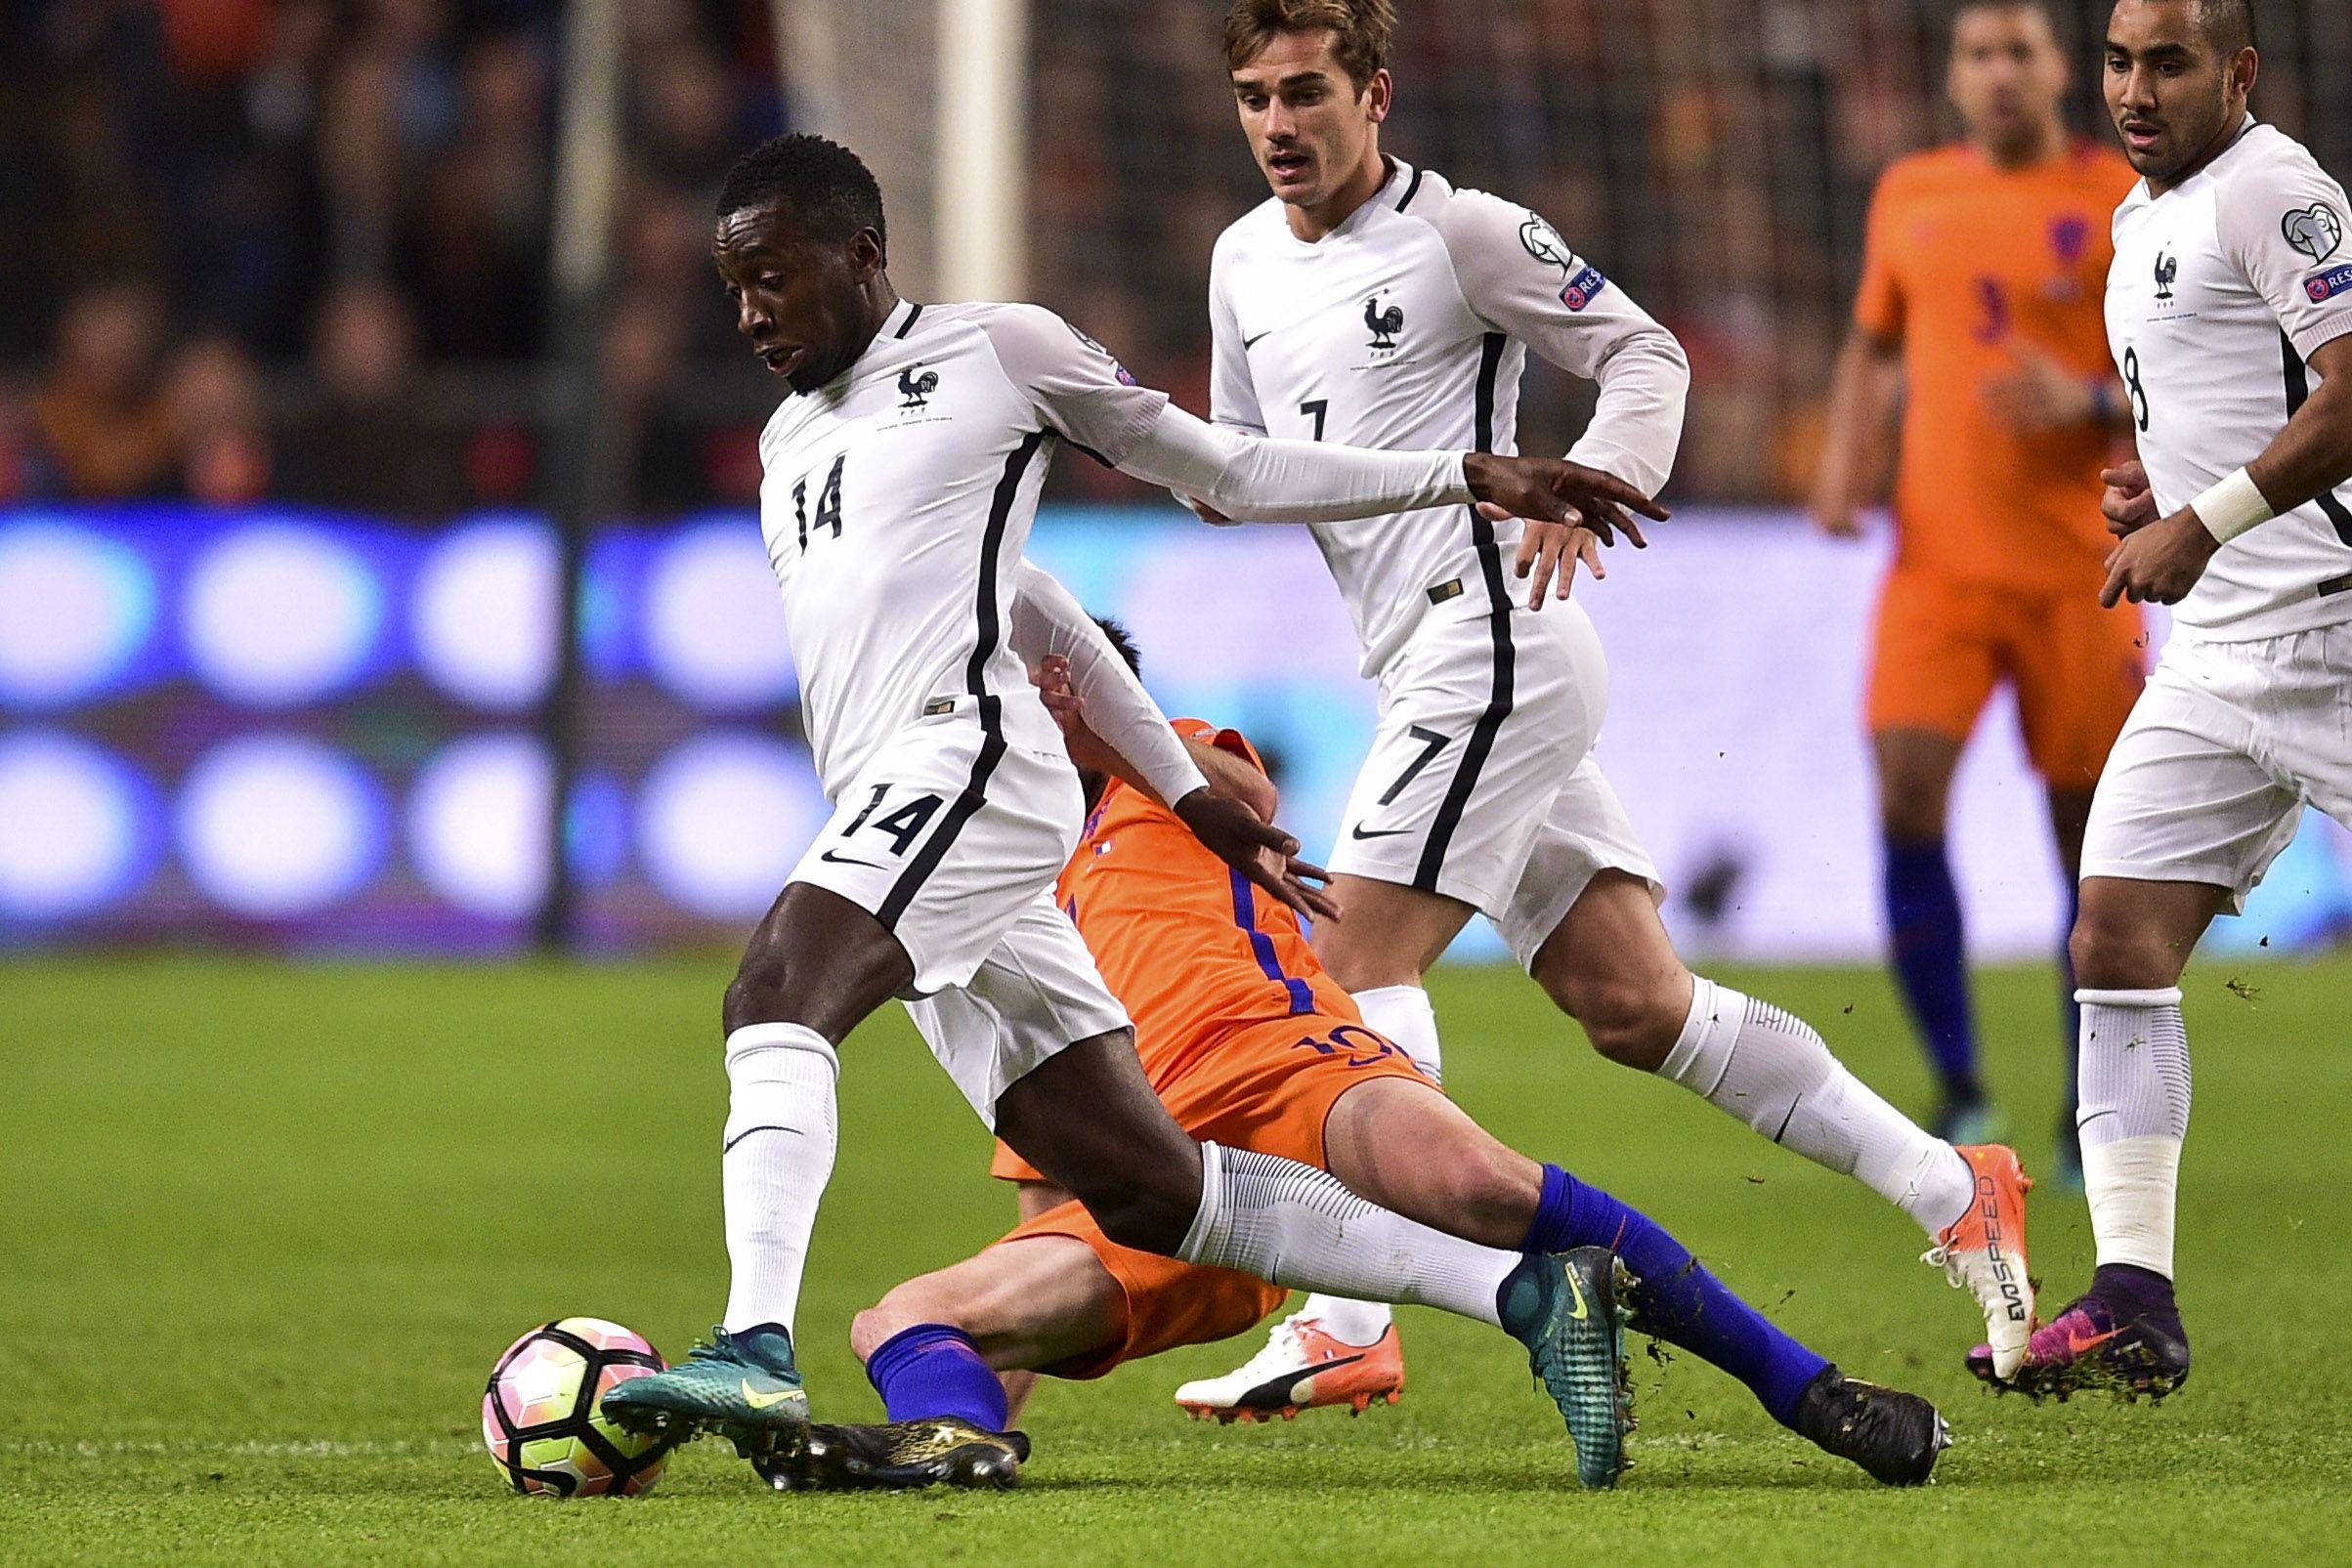 Football - Equipe de France - Matuidi : «Je prends mon pied à jouer avec Pogba»